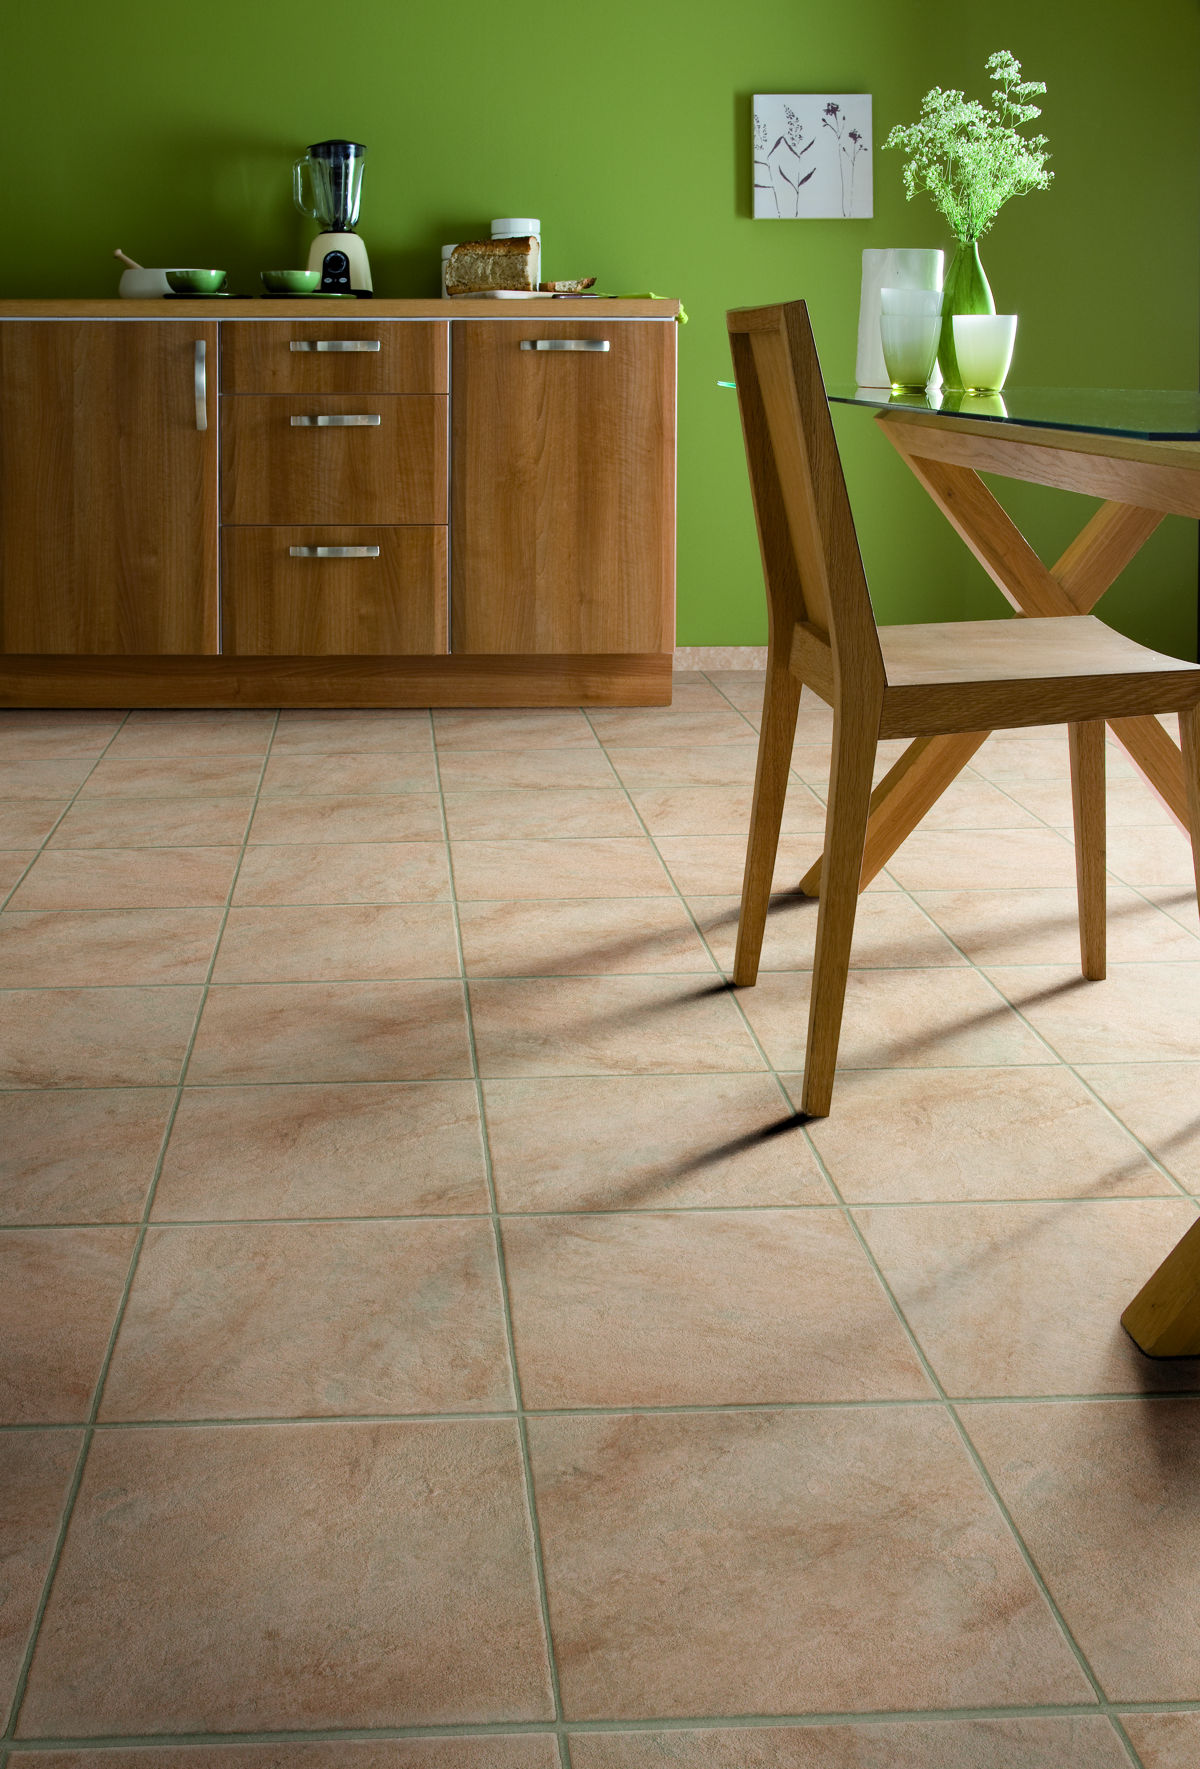 Laminate flooring tile kronospan stoneline xl moroccan stone dailygadgetfo Choice Image